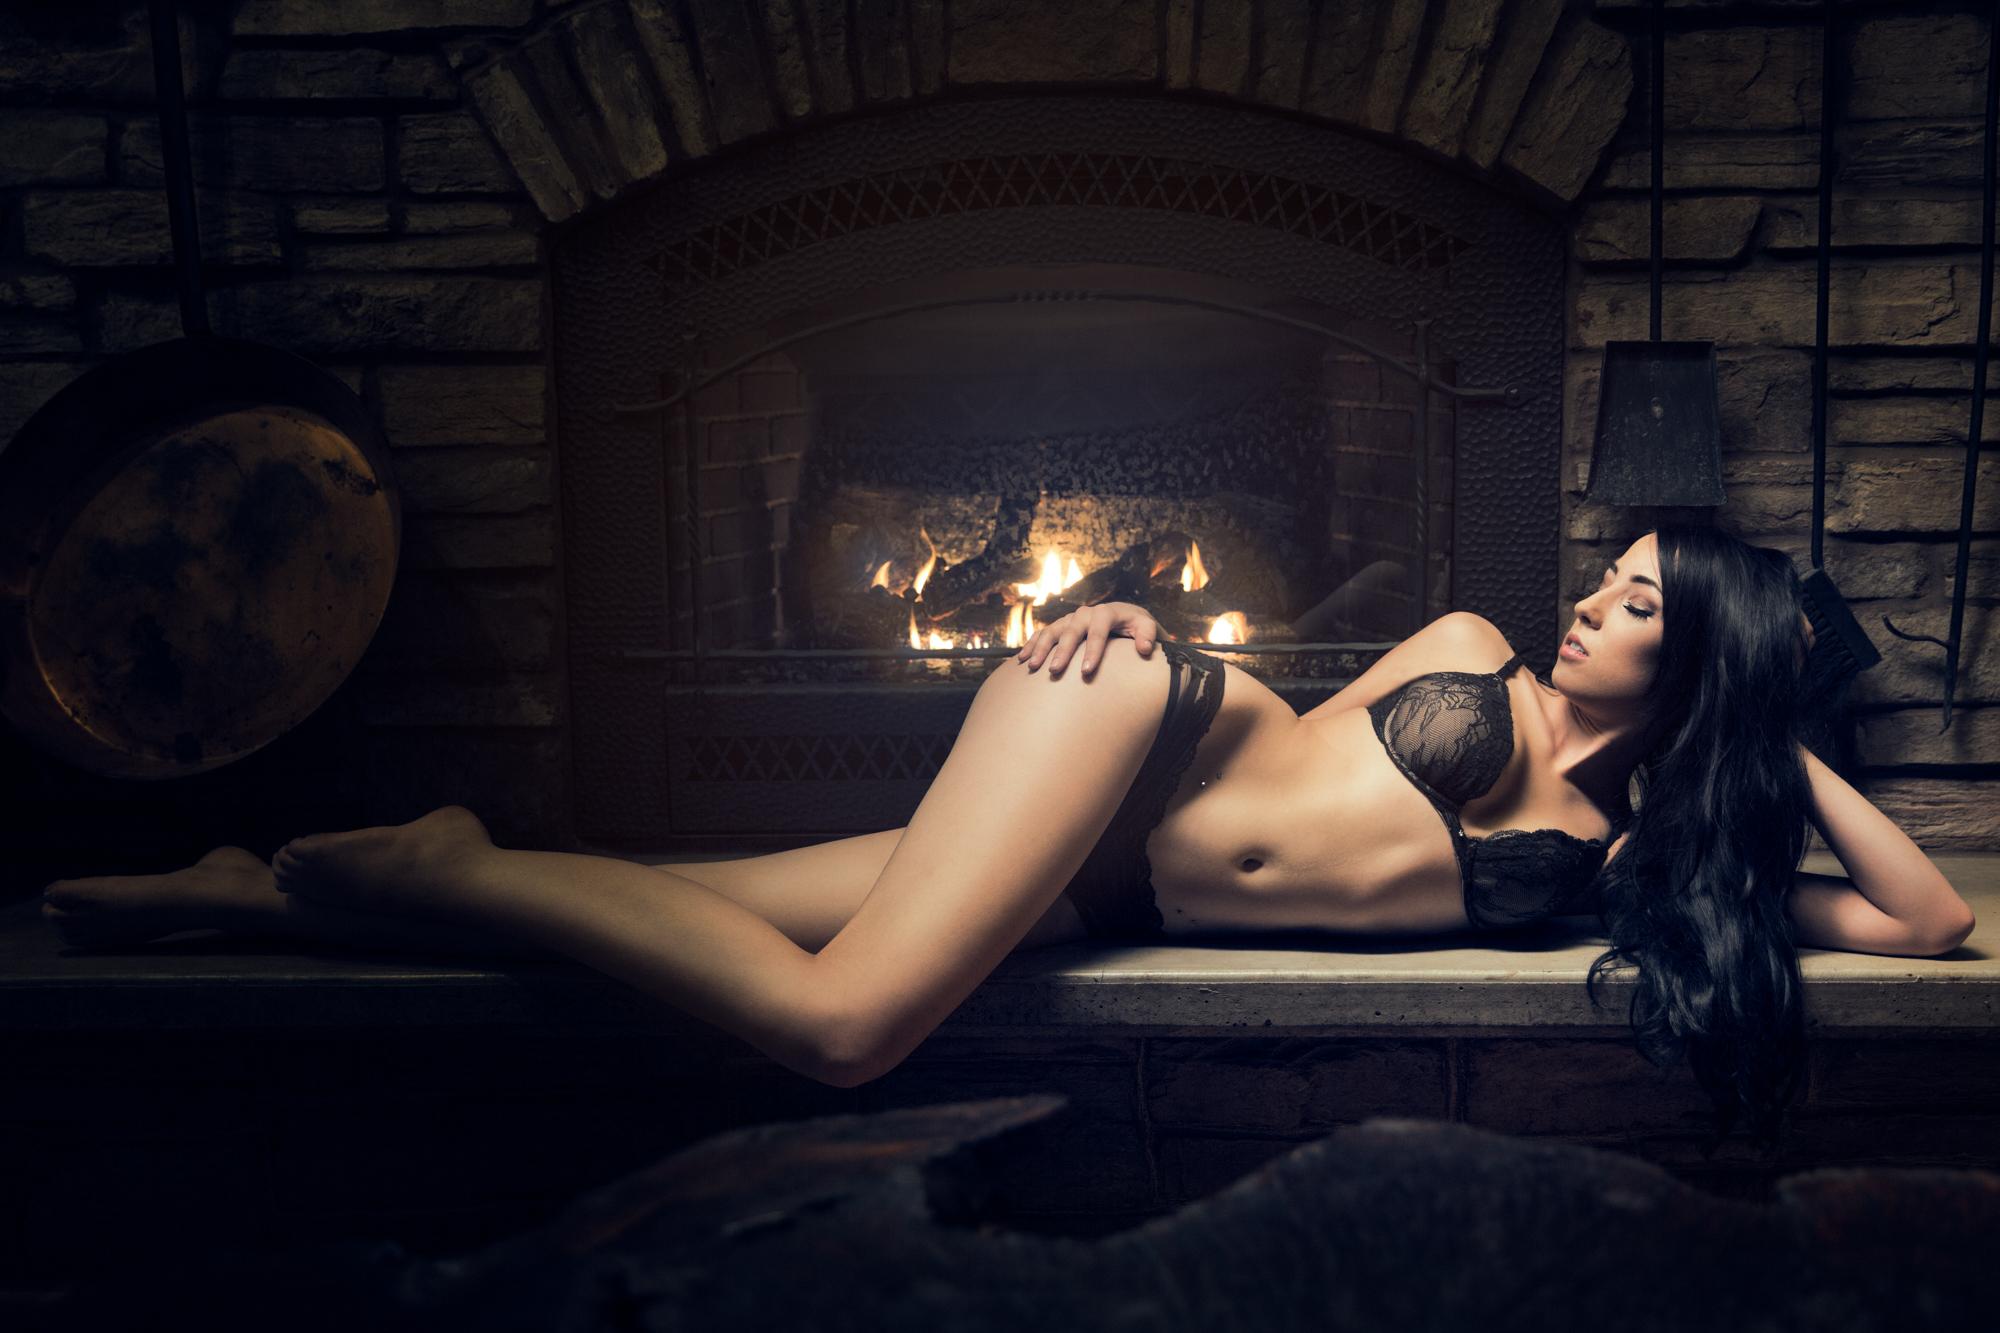 tasteful boudoir photography of Vanessa near a fireplace.